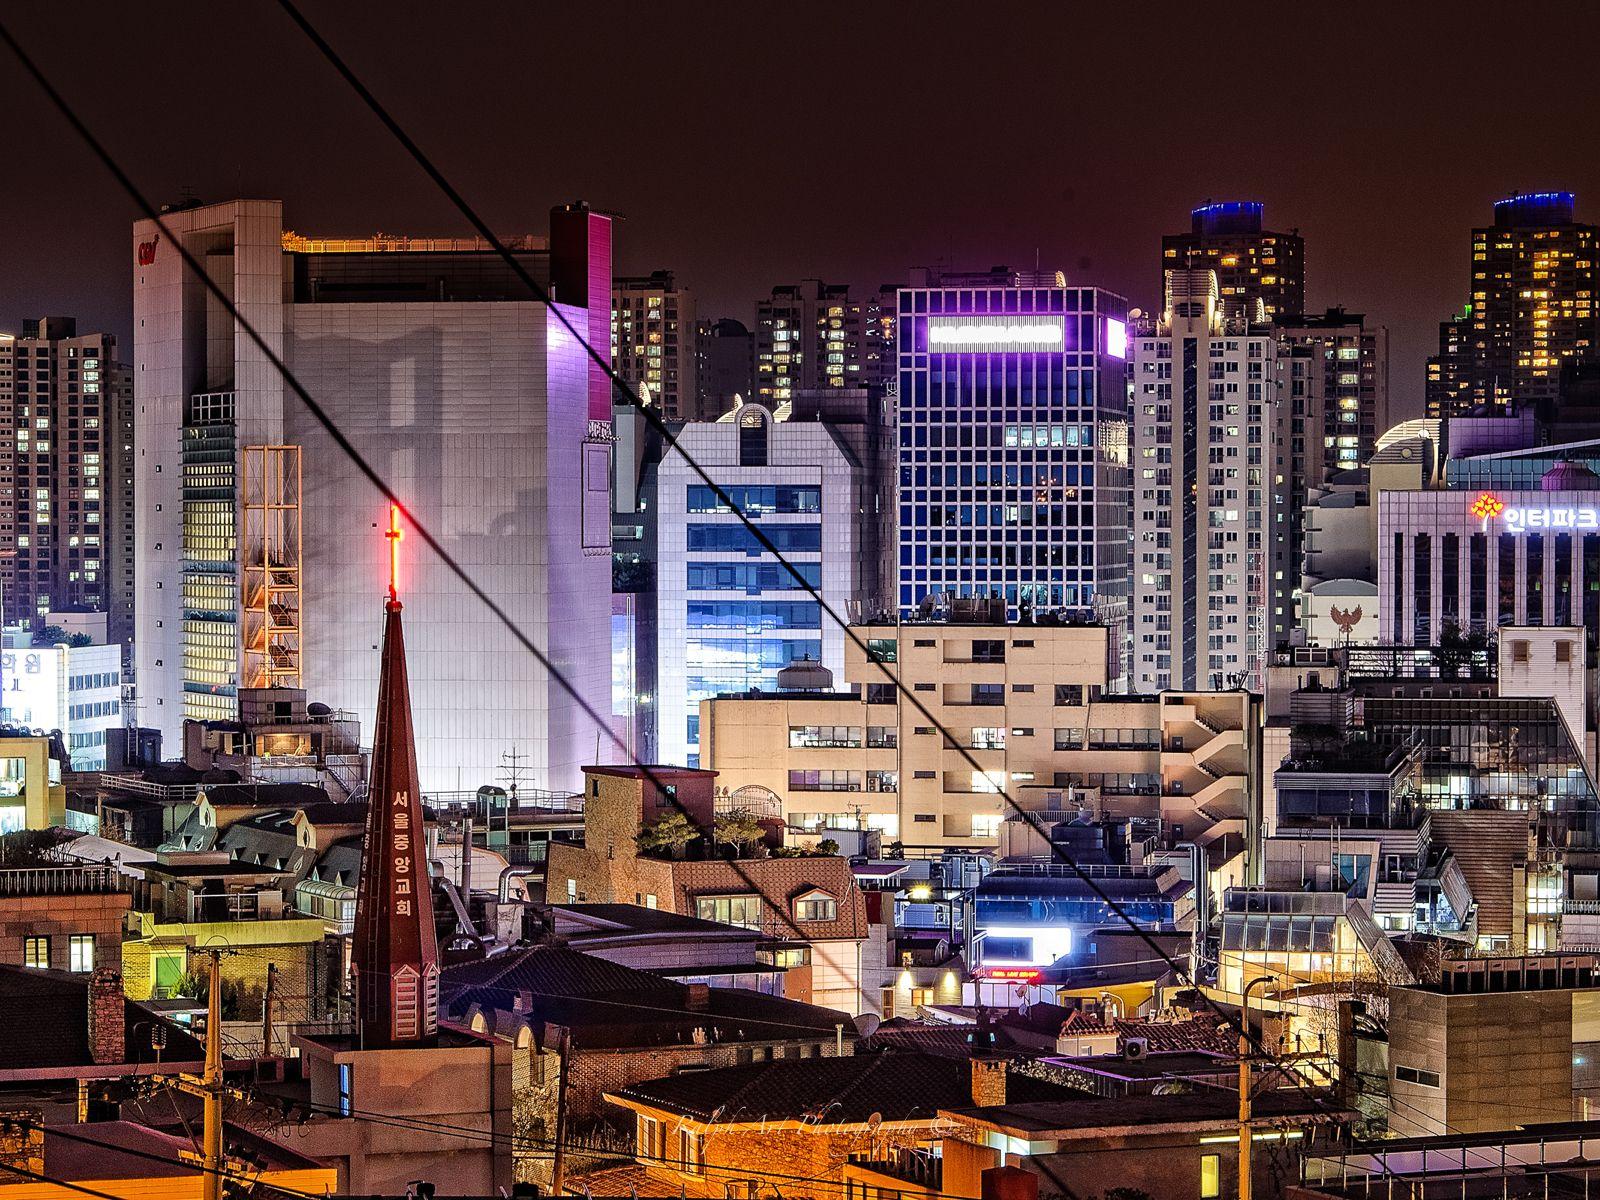 Urban Gangnam  #urbanisation #gangnam #seoul #korea